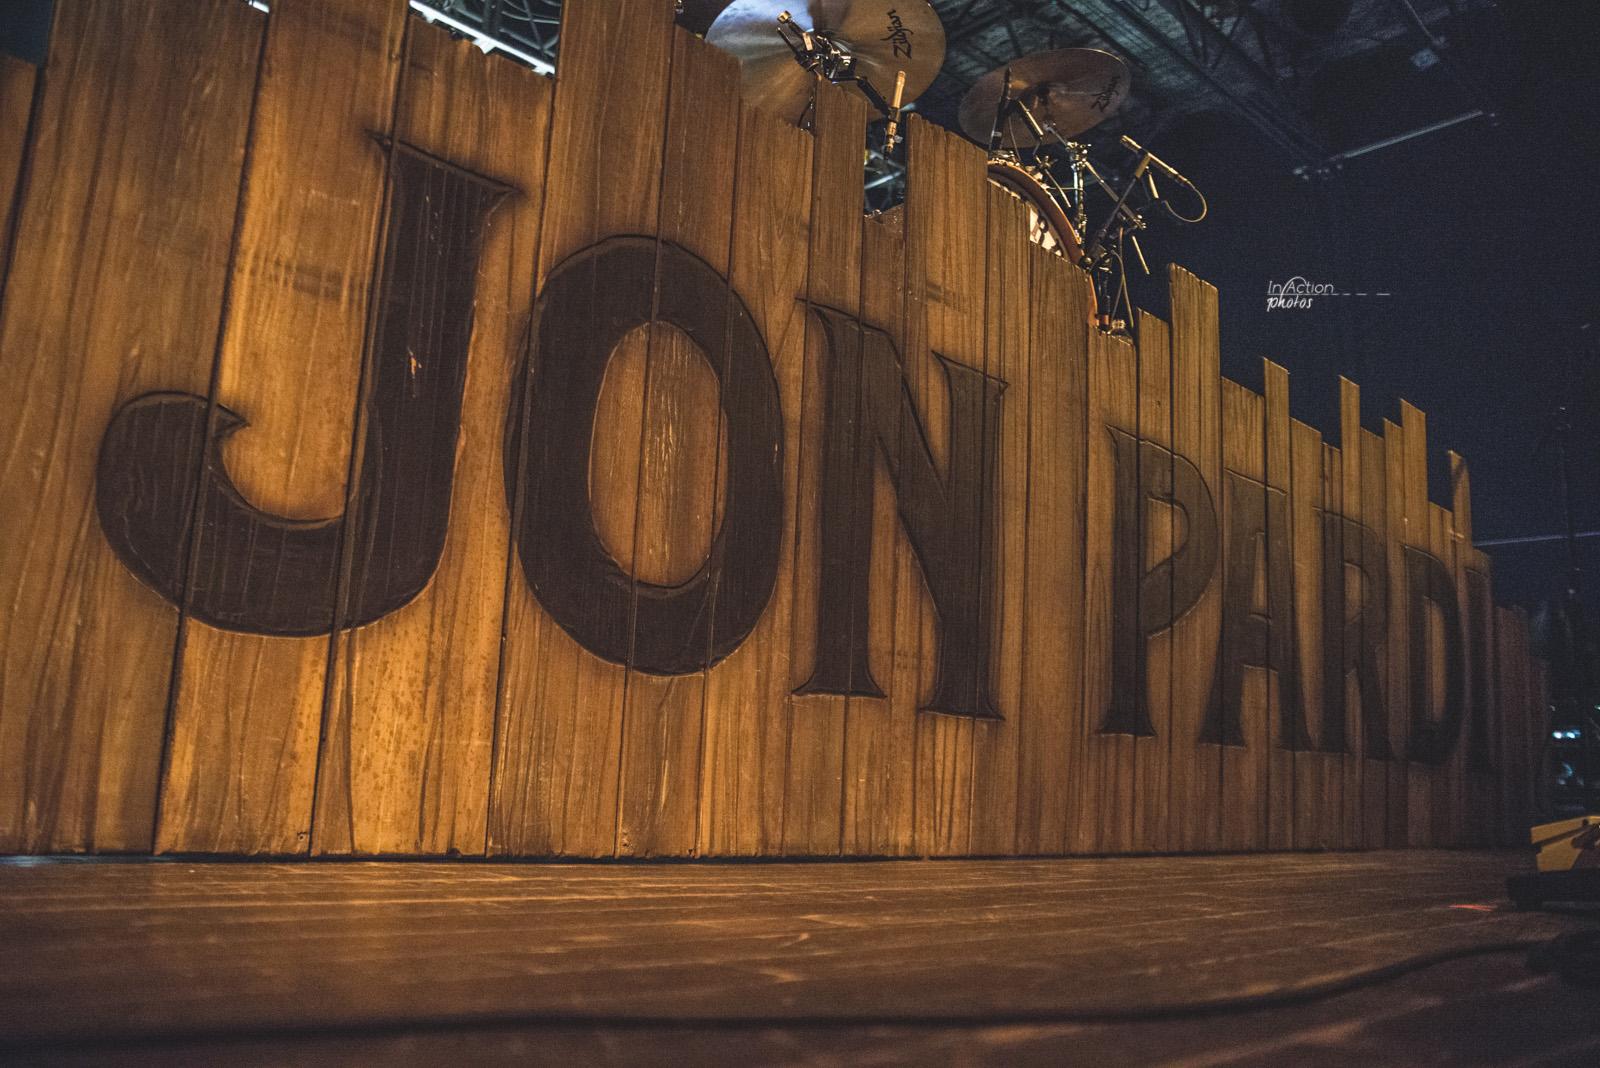 20161028_Jon Pardi_Performance_Johnson09257.jpg